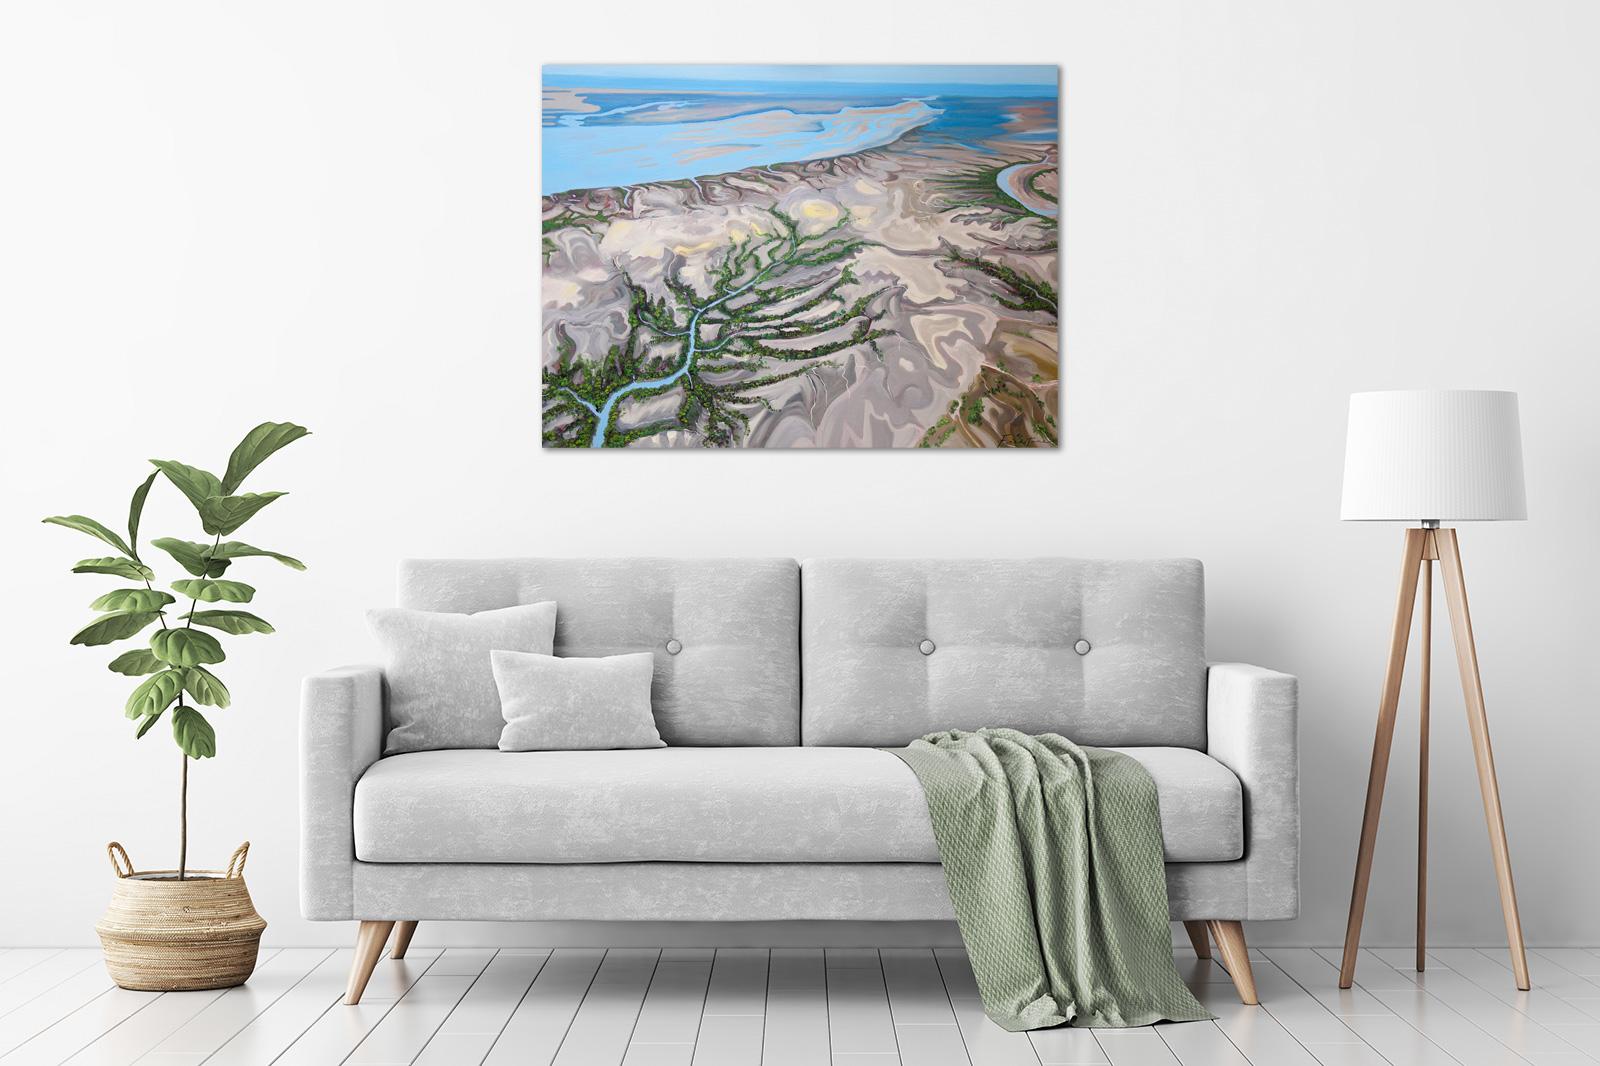 Composition II, Buccaneer Archipelago, The Kimberley in a room